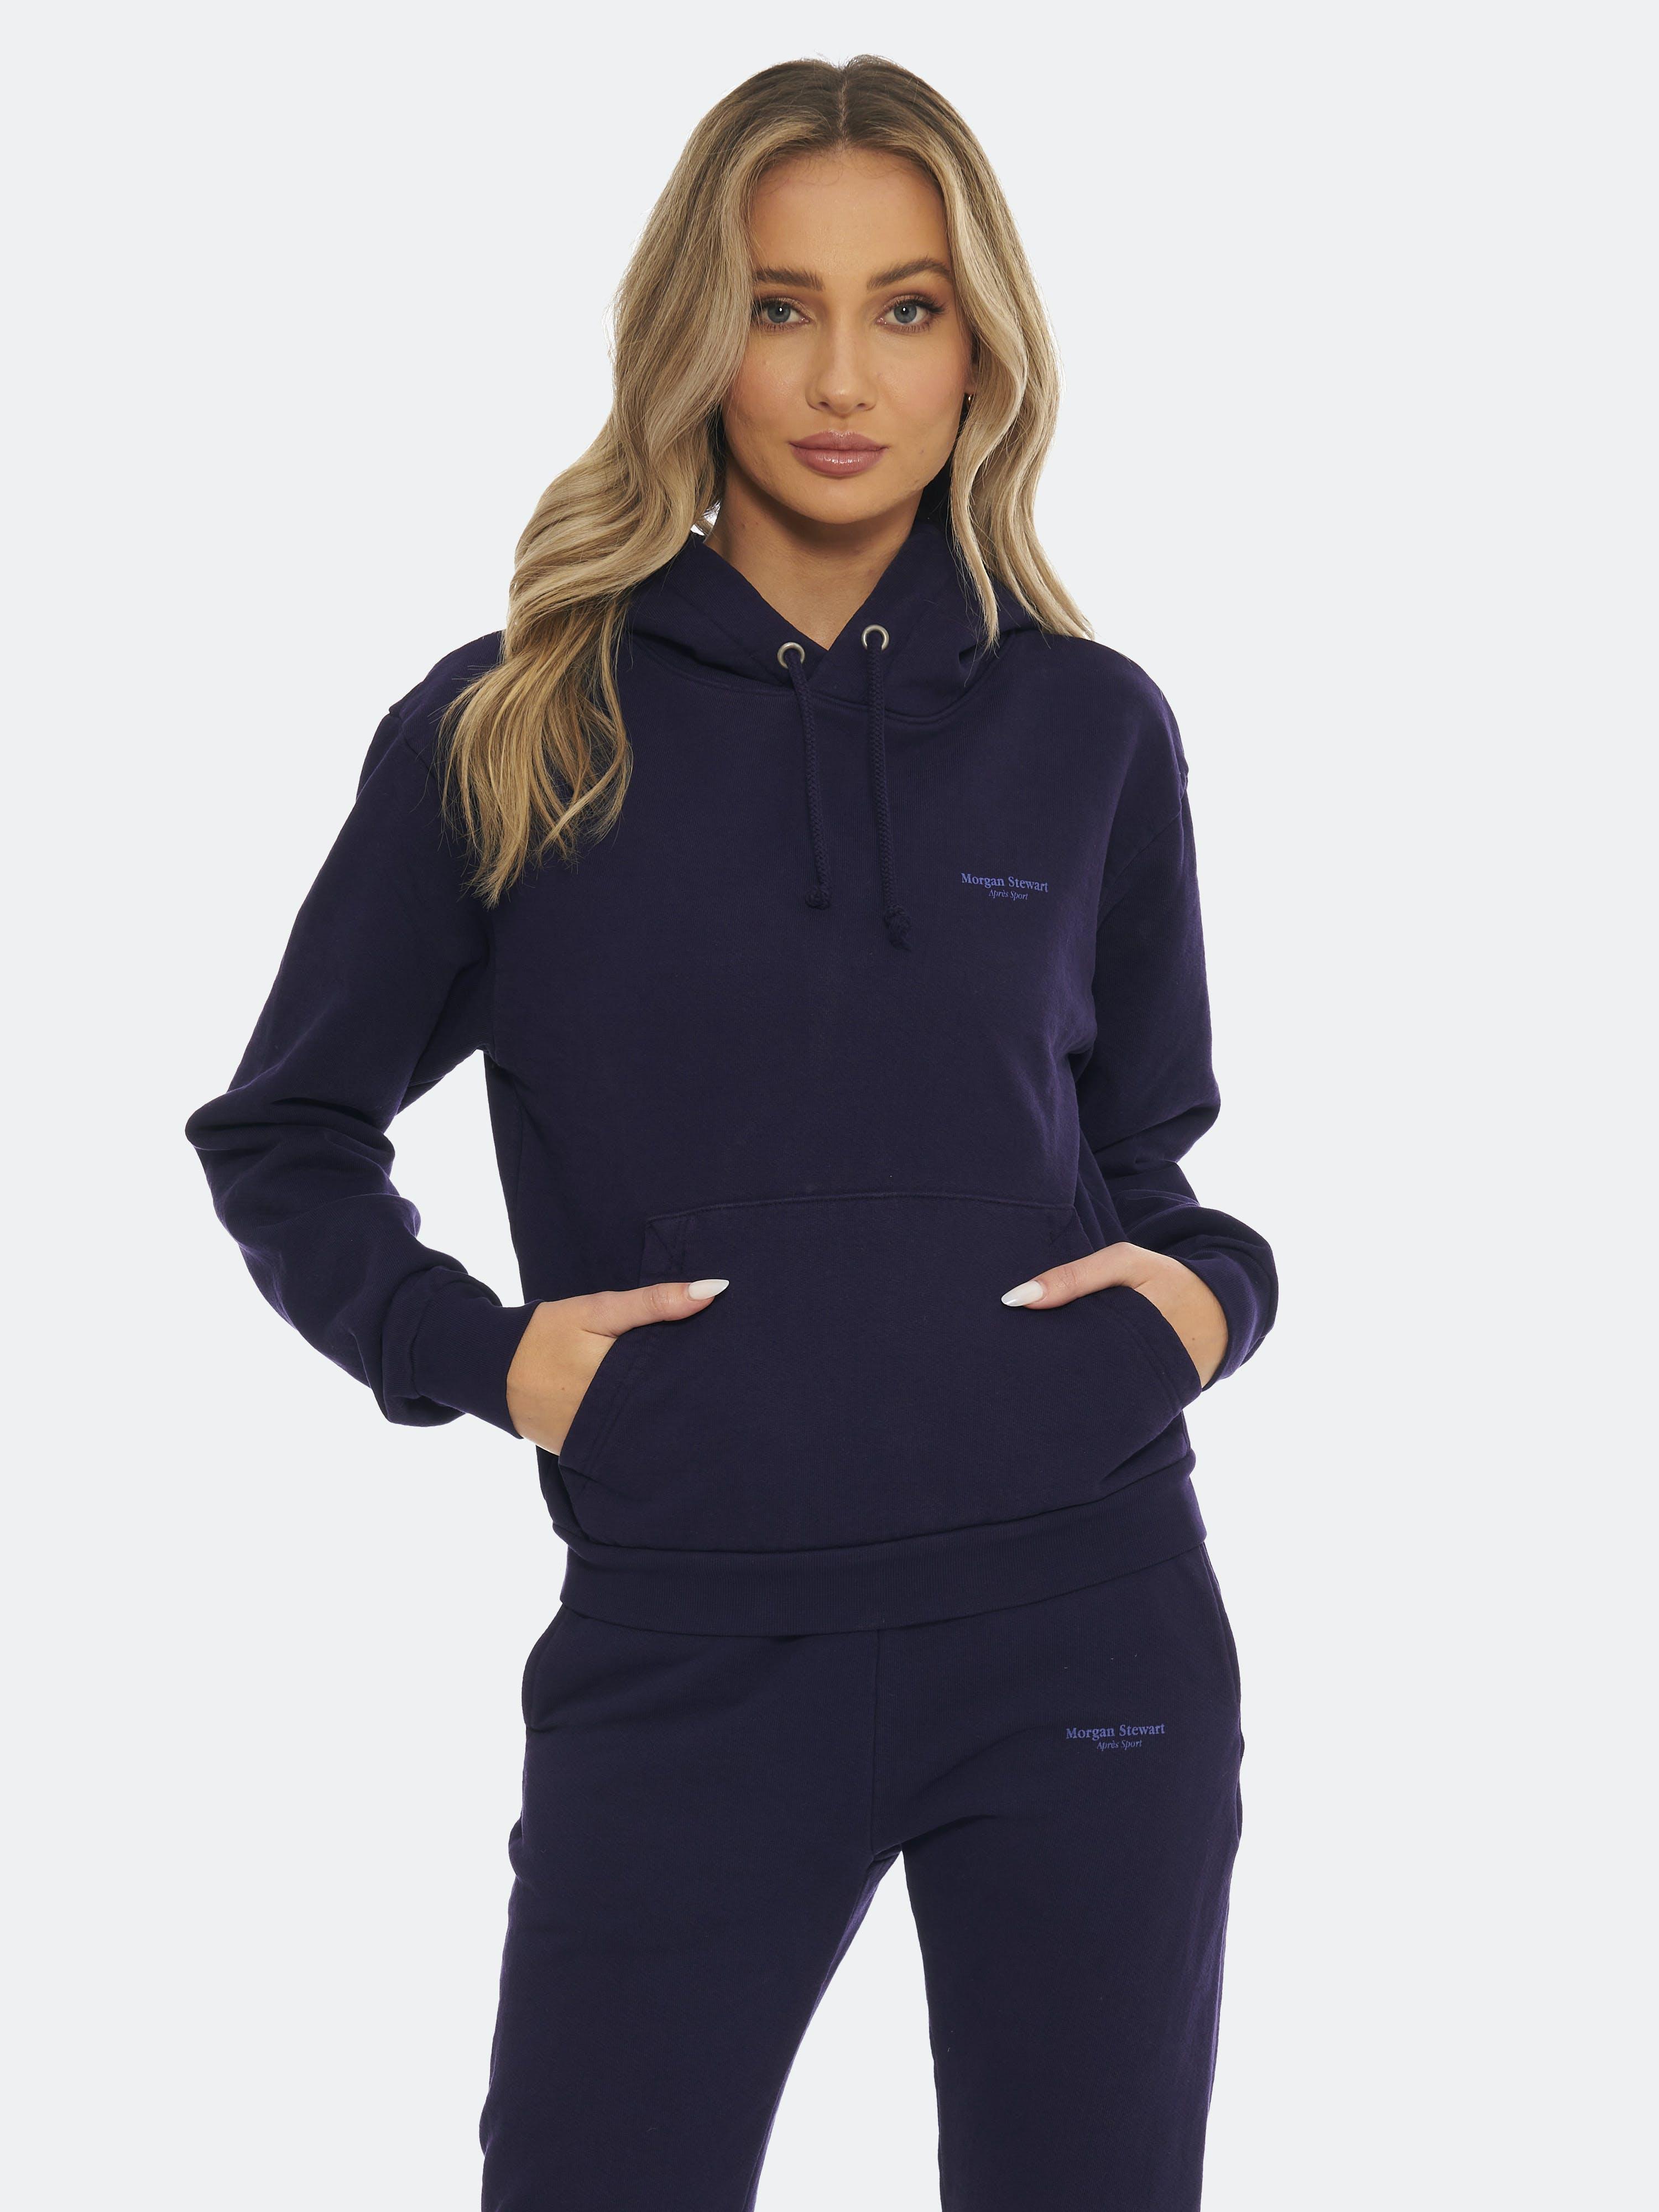 Morgan Stewart Sport Hoodie - XS - Also in: S, M, L  - Blue